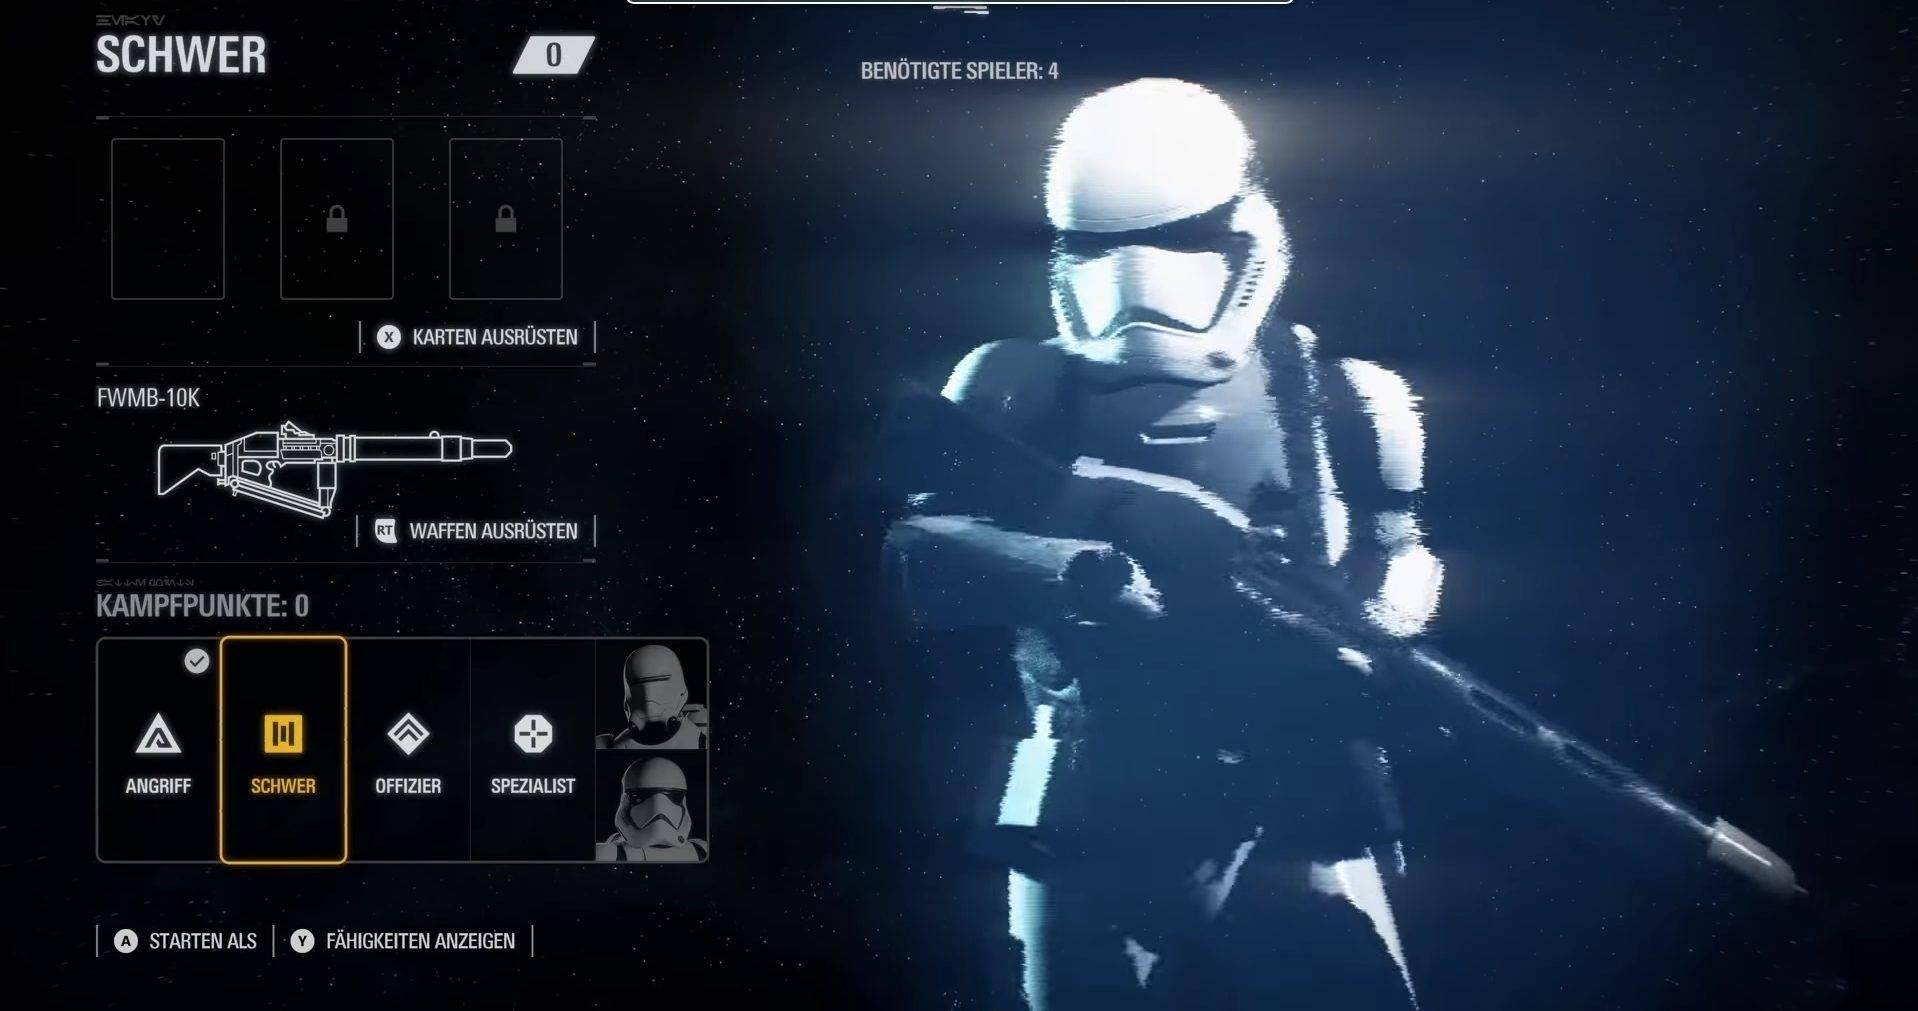 Electronic Arts wert wieder stark gestiegen